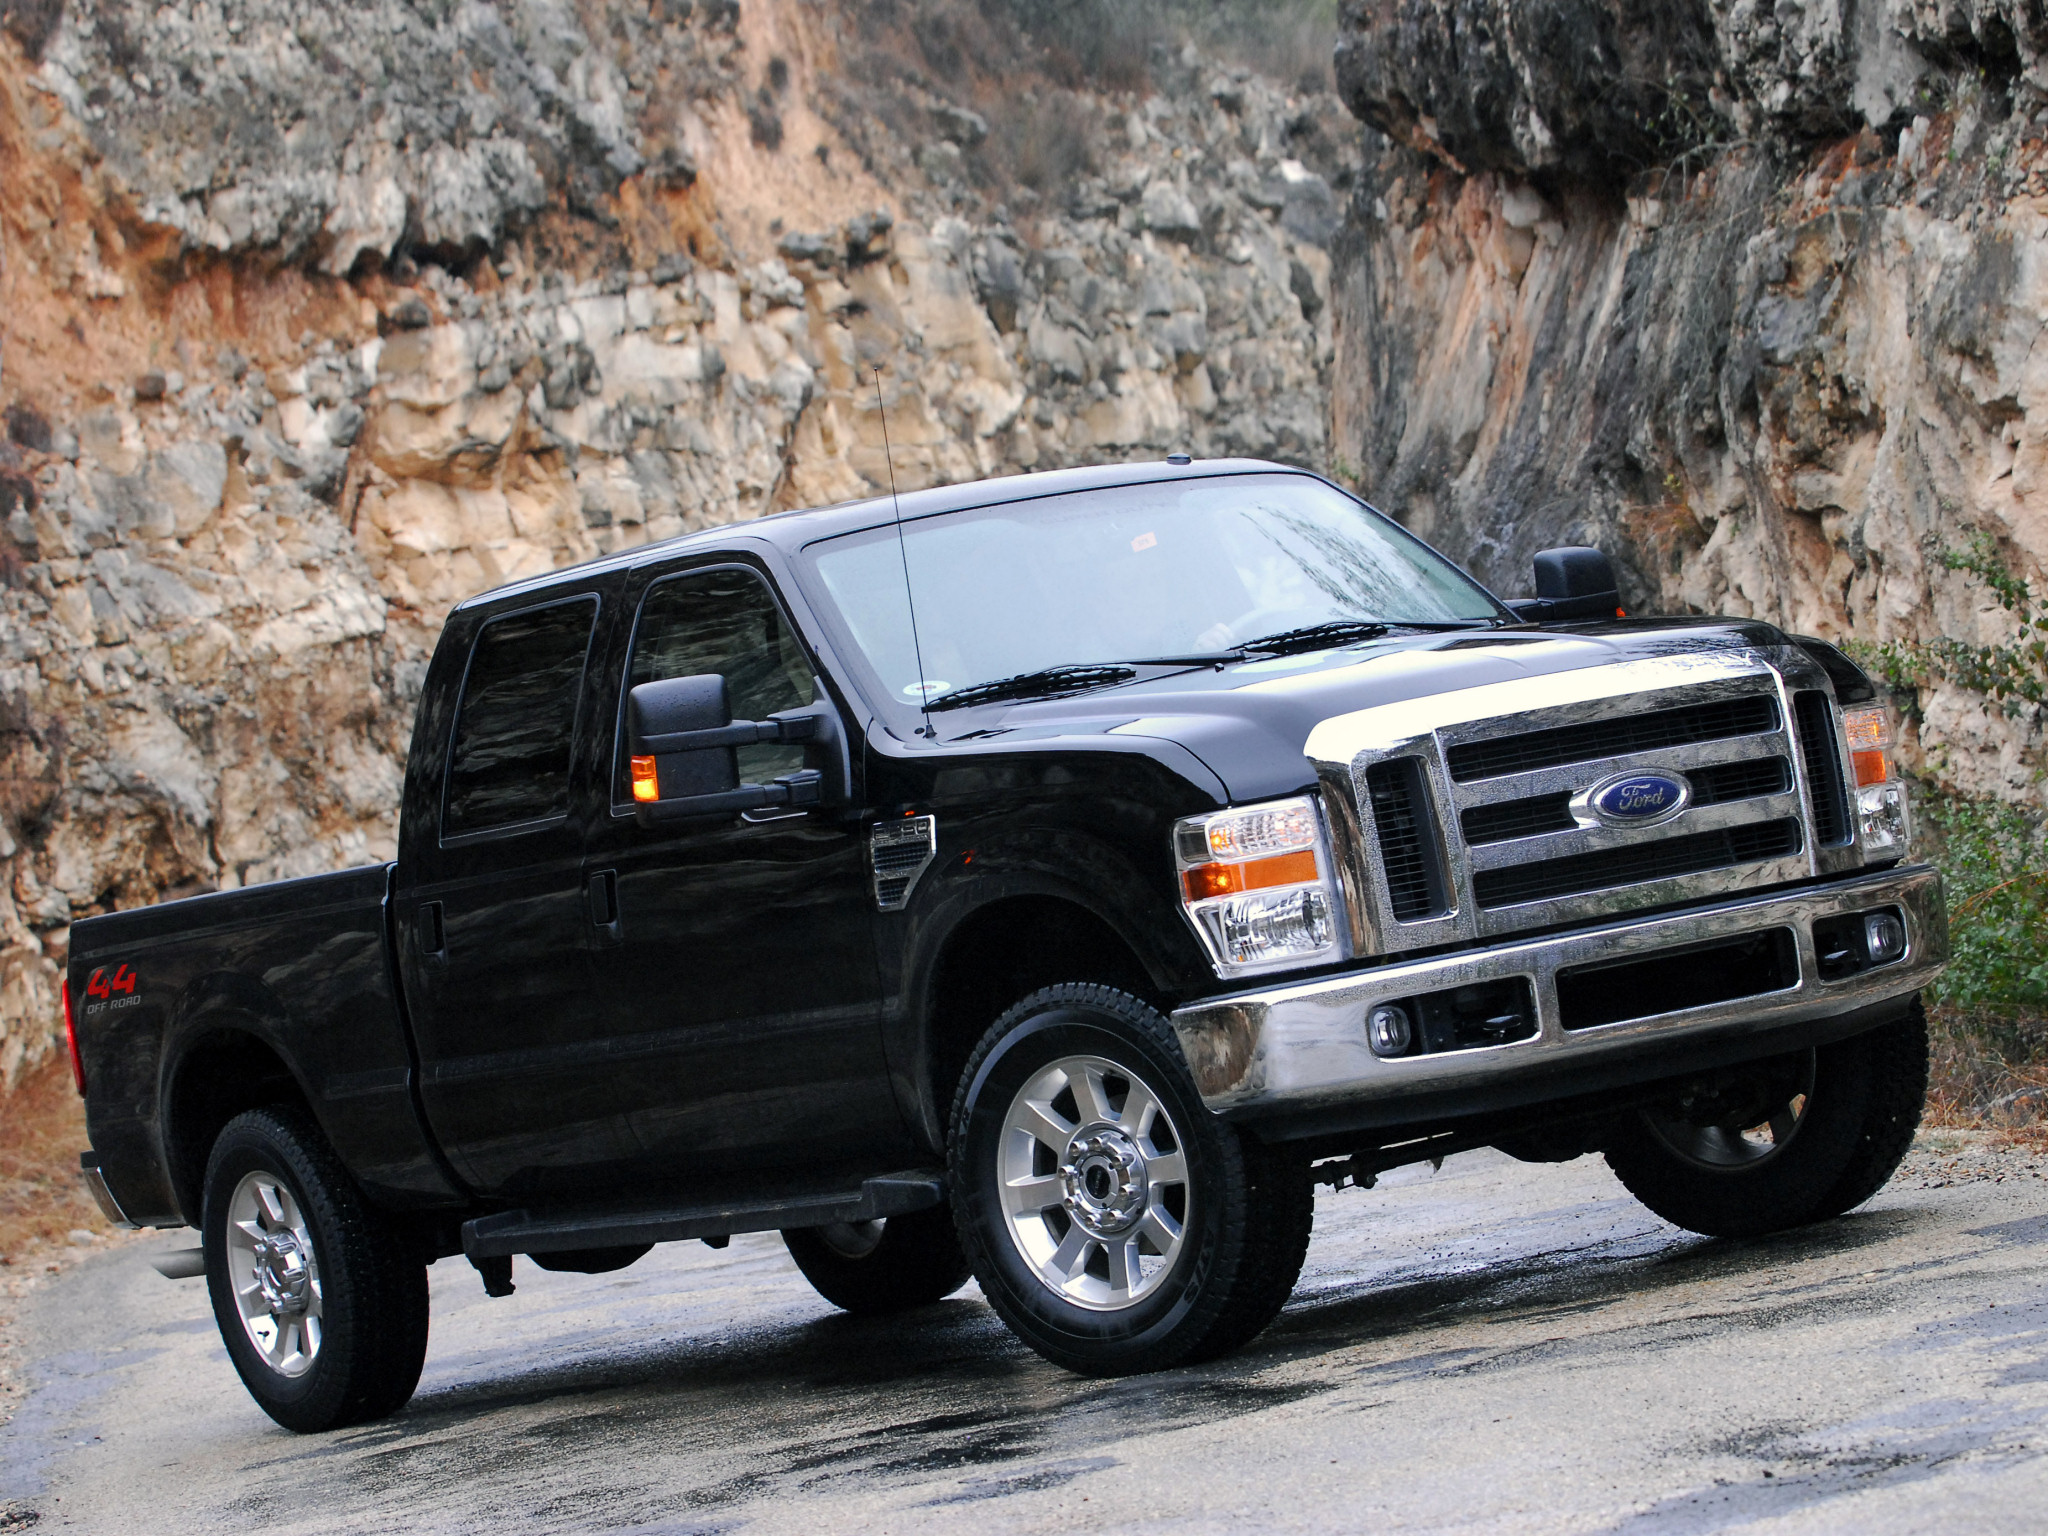 2008 Ford F 250 SuperDuty truck 4x4 g wallpaper background 2048x1536